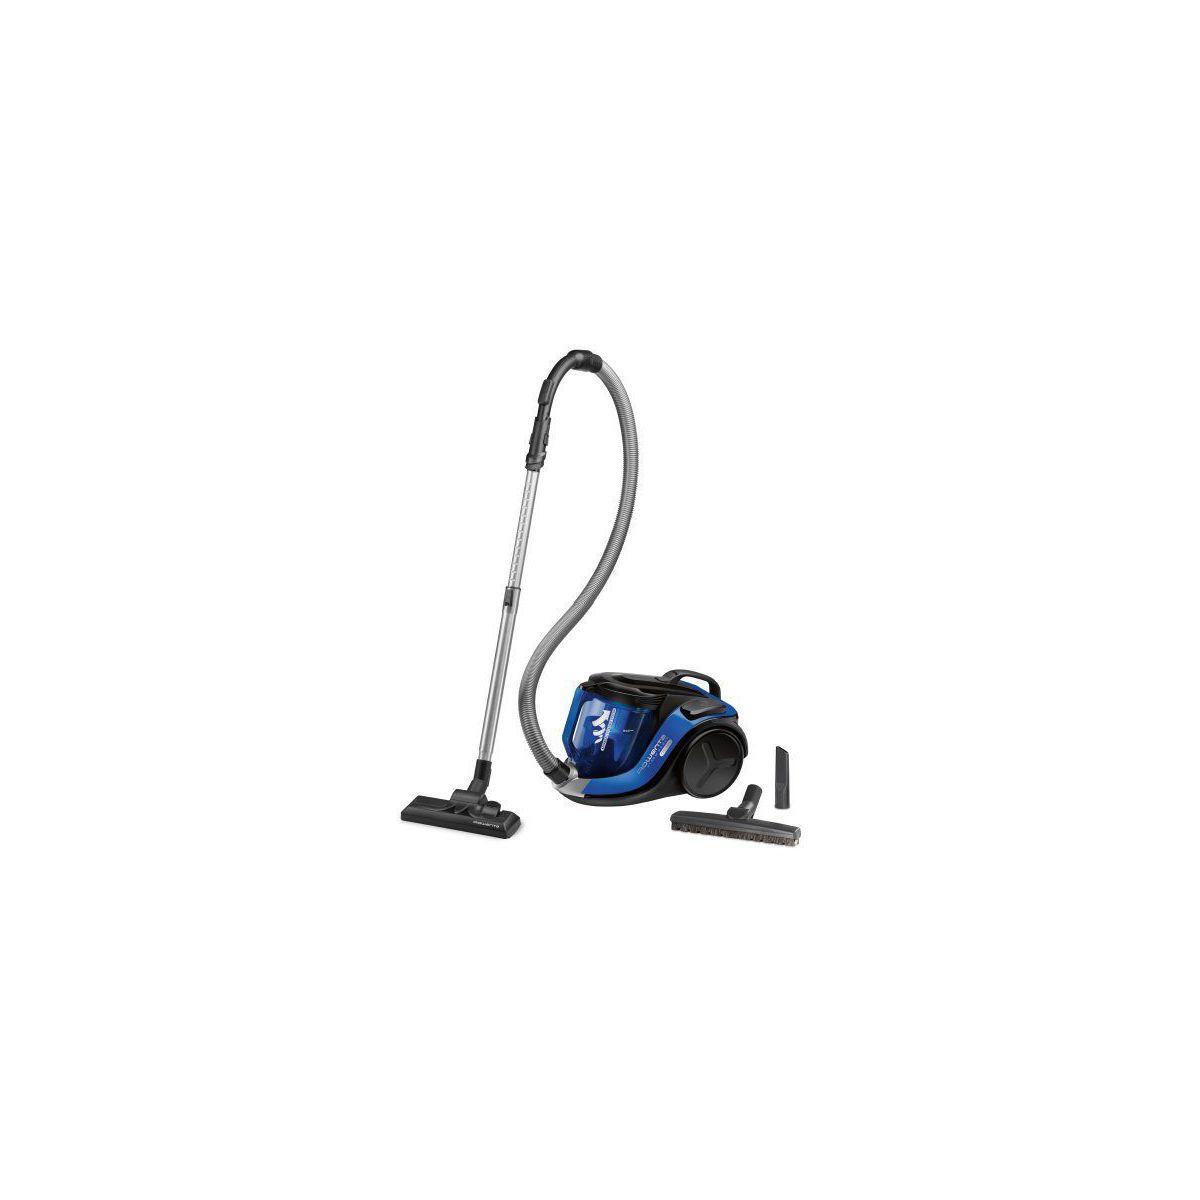 Aspirateur sans sac rowenta ro6941ea x-trem power cyclonic